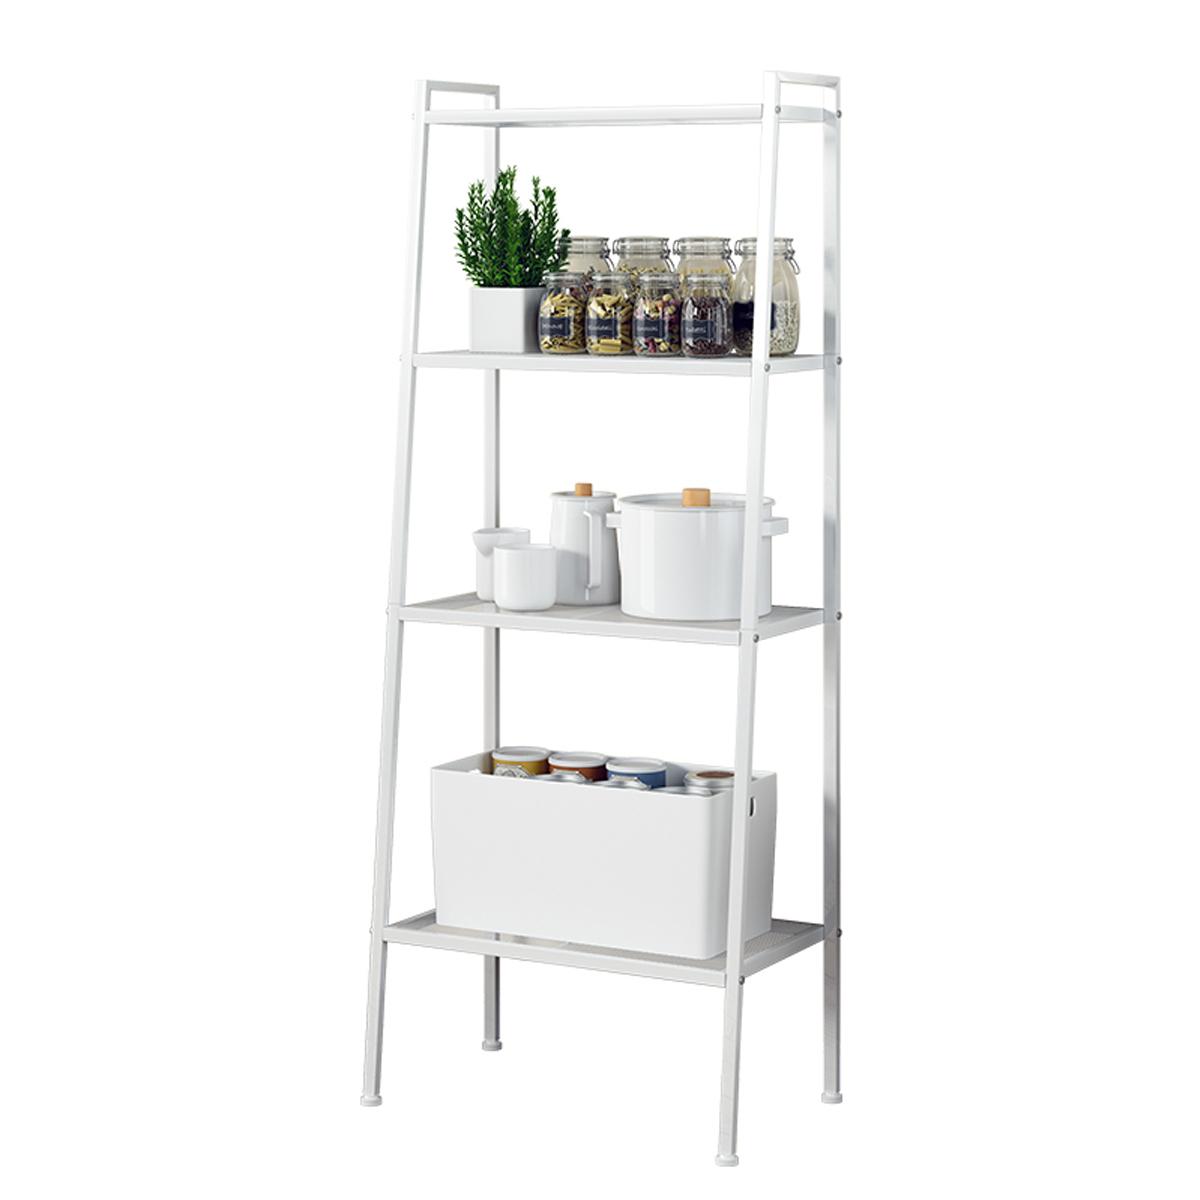 novashion 4 tier storage shelf metal ladder shelves portable display rack plant flower stand rack storage for bathroom living room walmart com